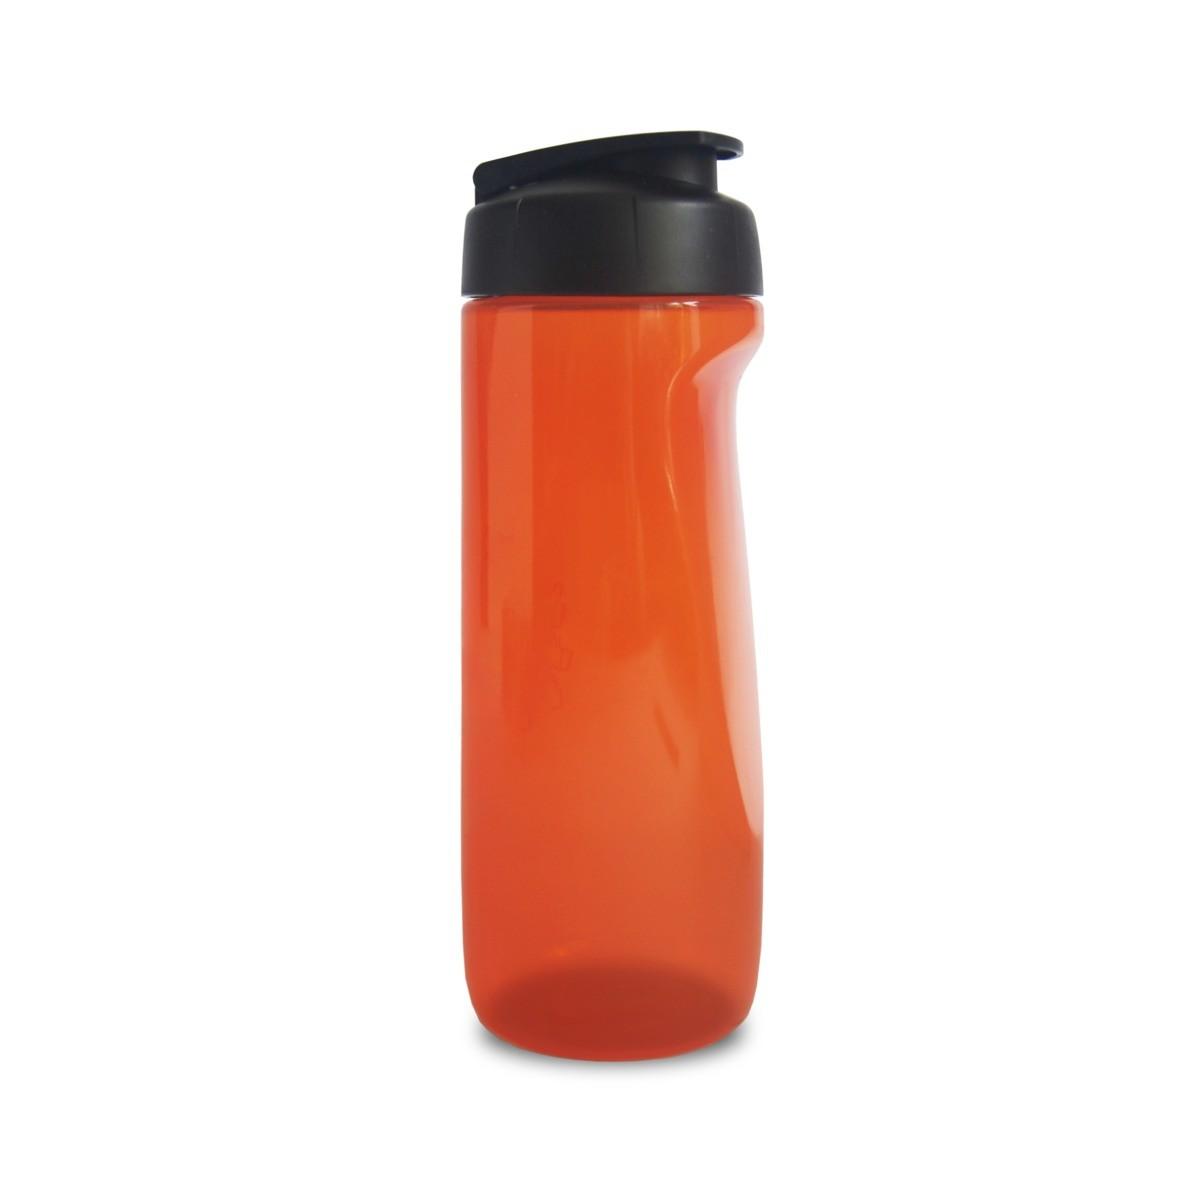 Vattenflaska Kick orange